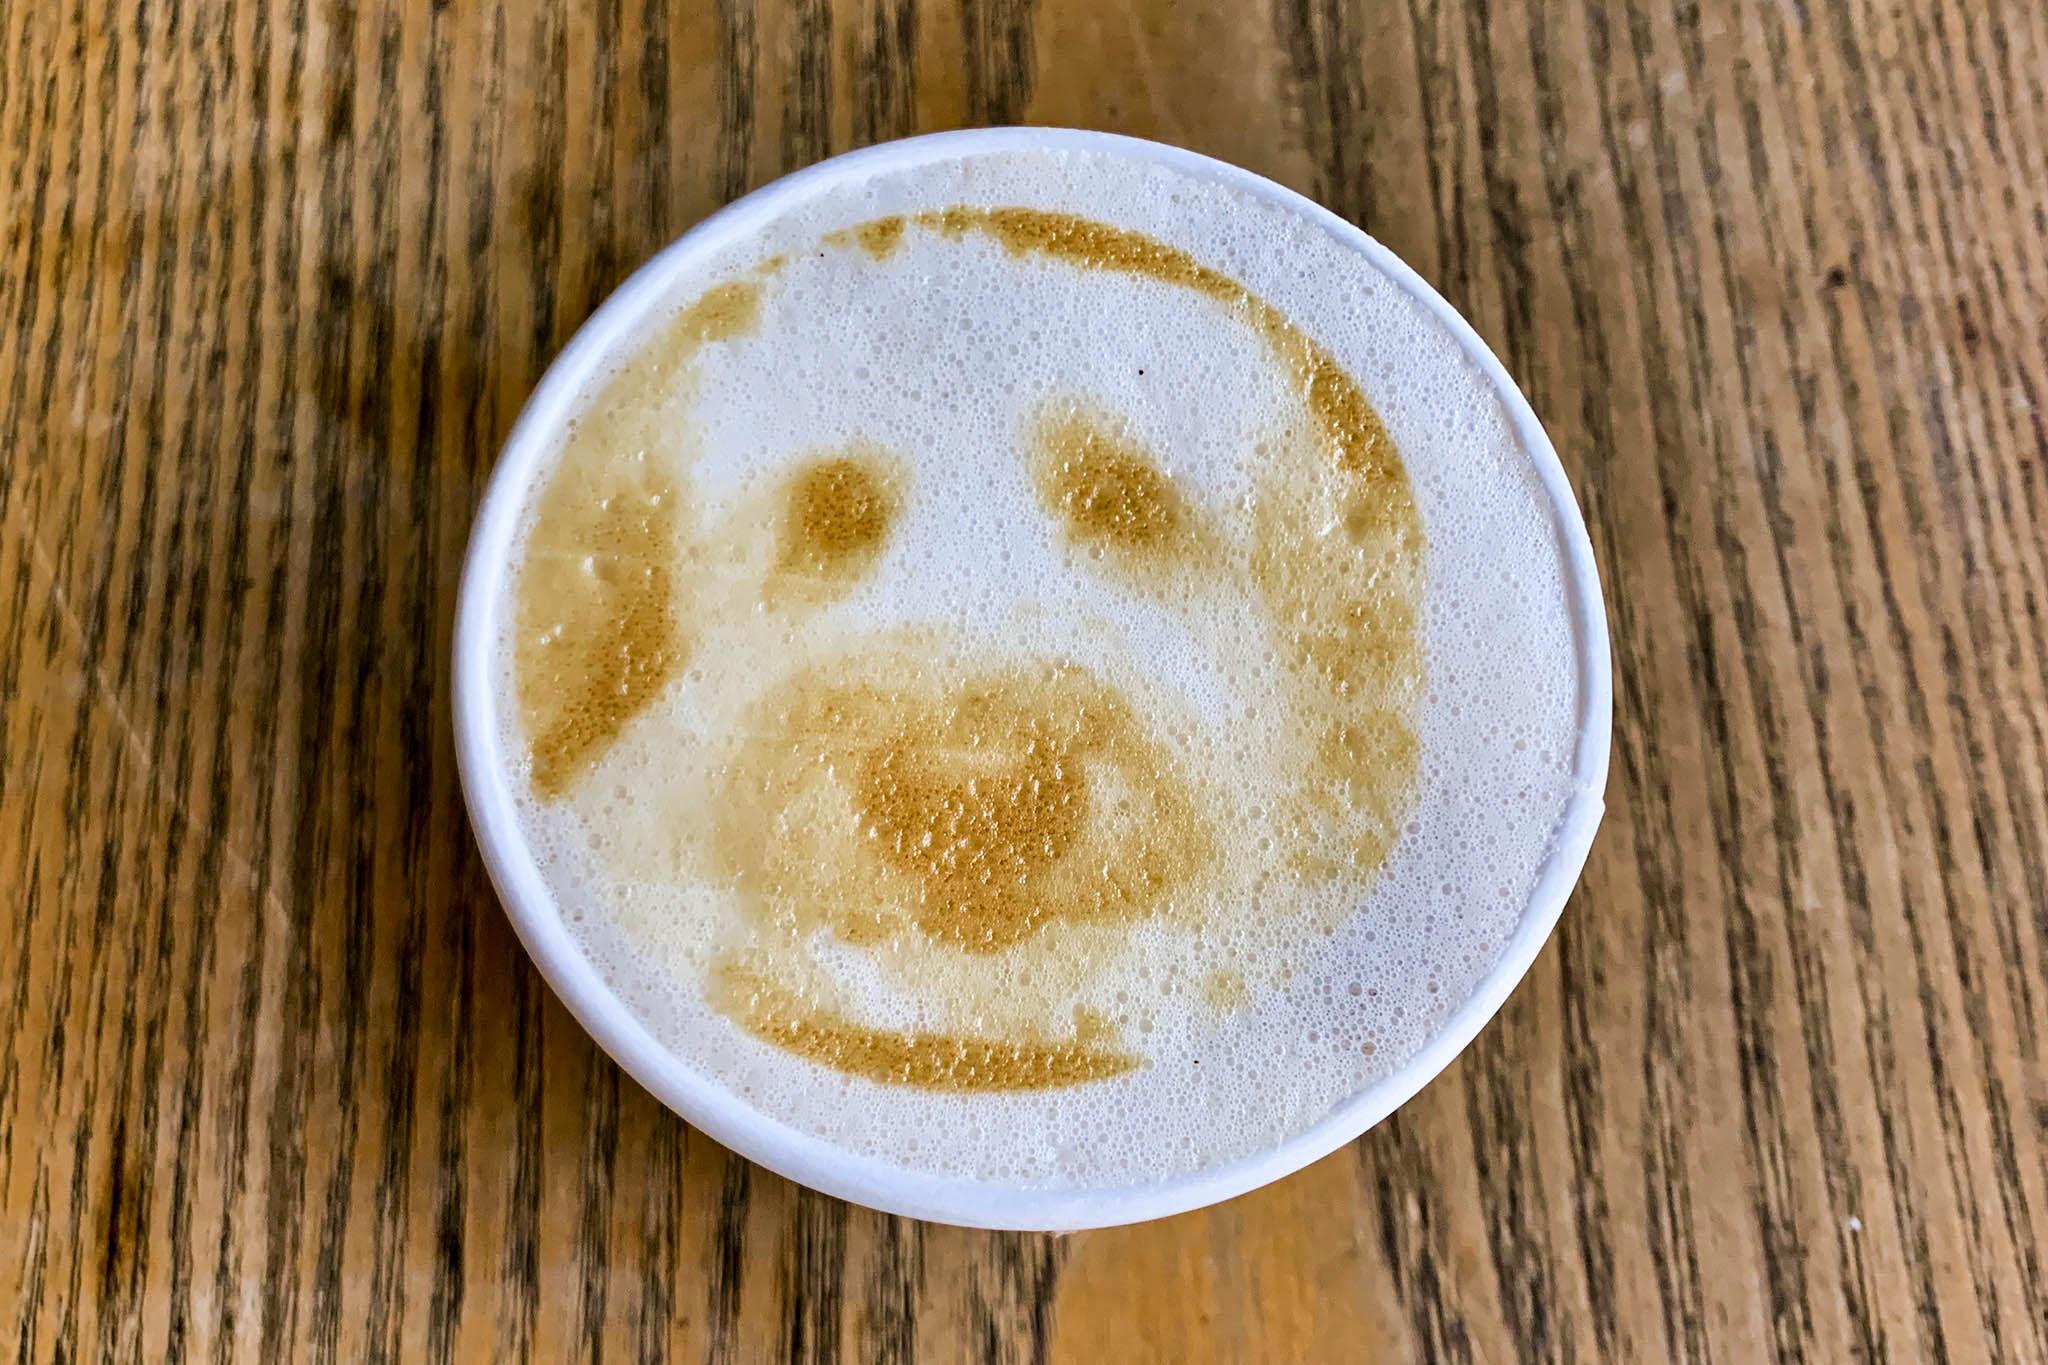 Bali Coffee serves digital latte art